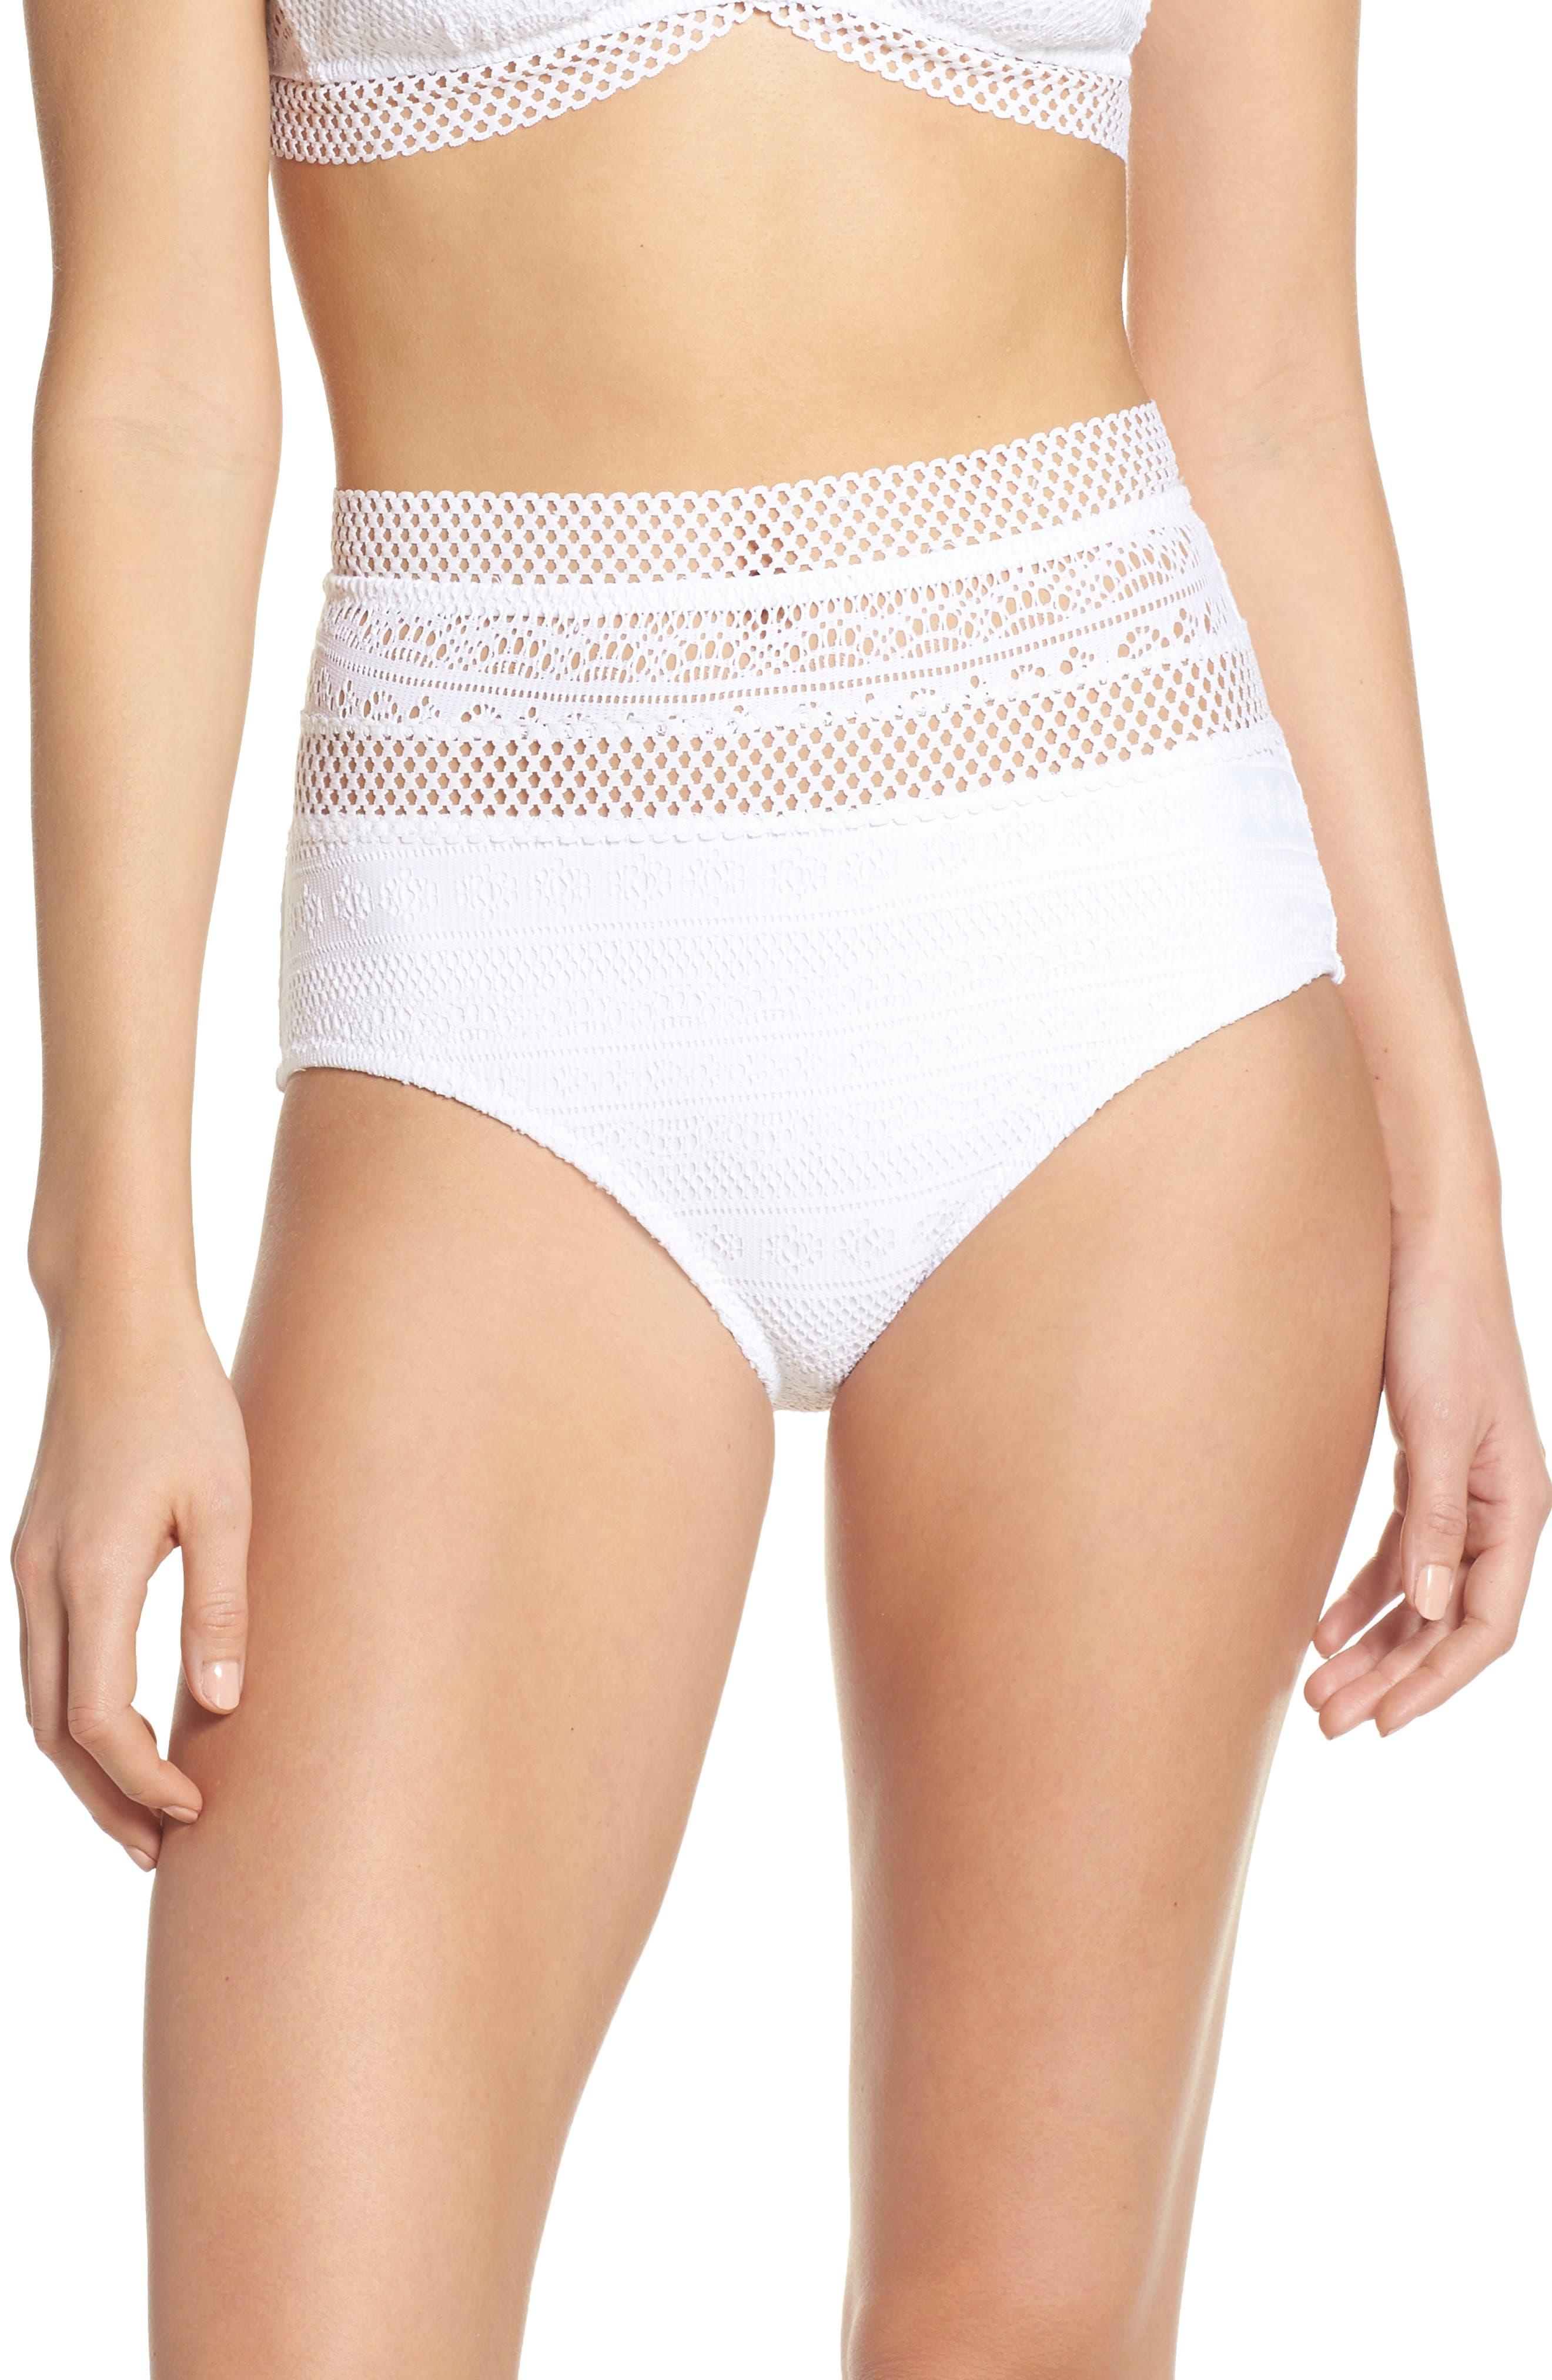 Becca Captured High Waist Bikini Bottoms, White